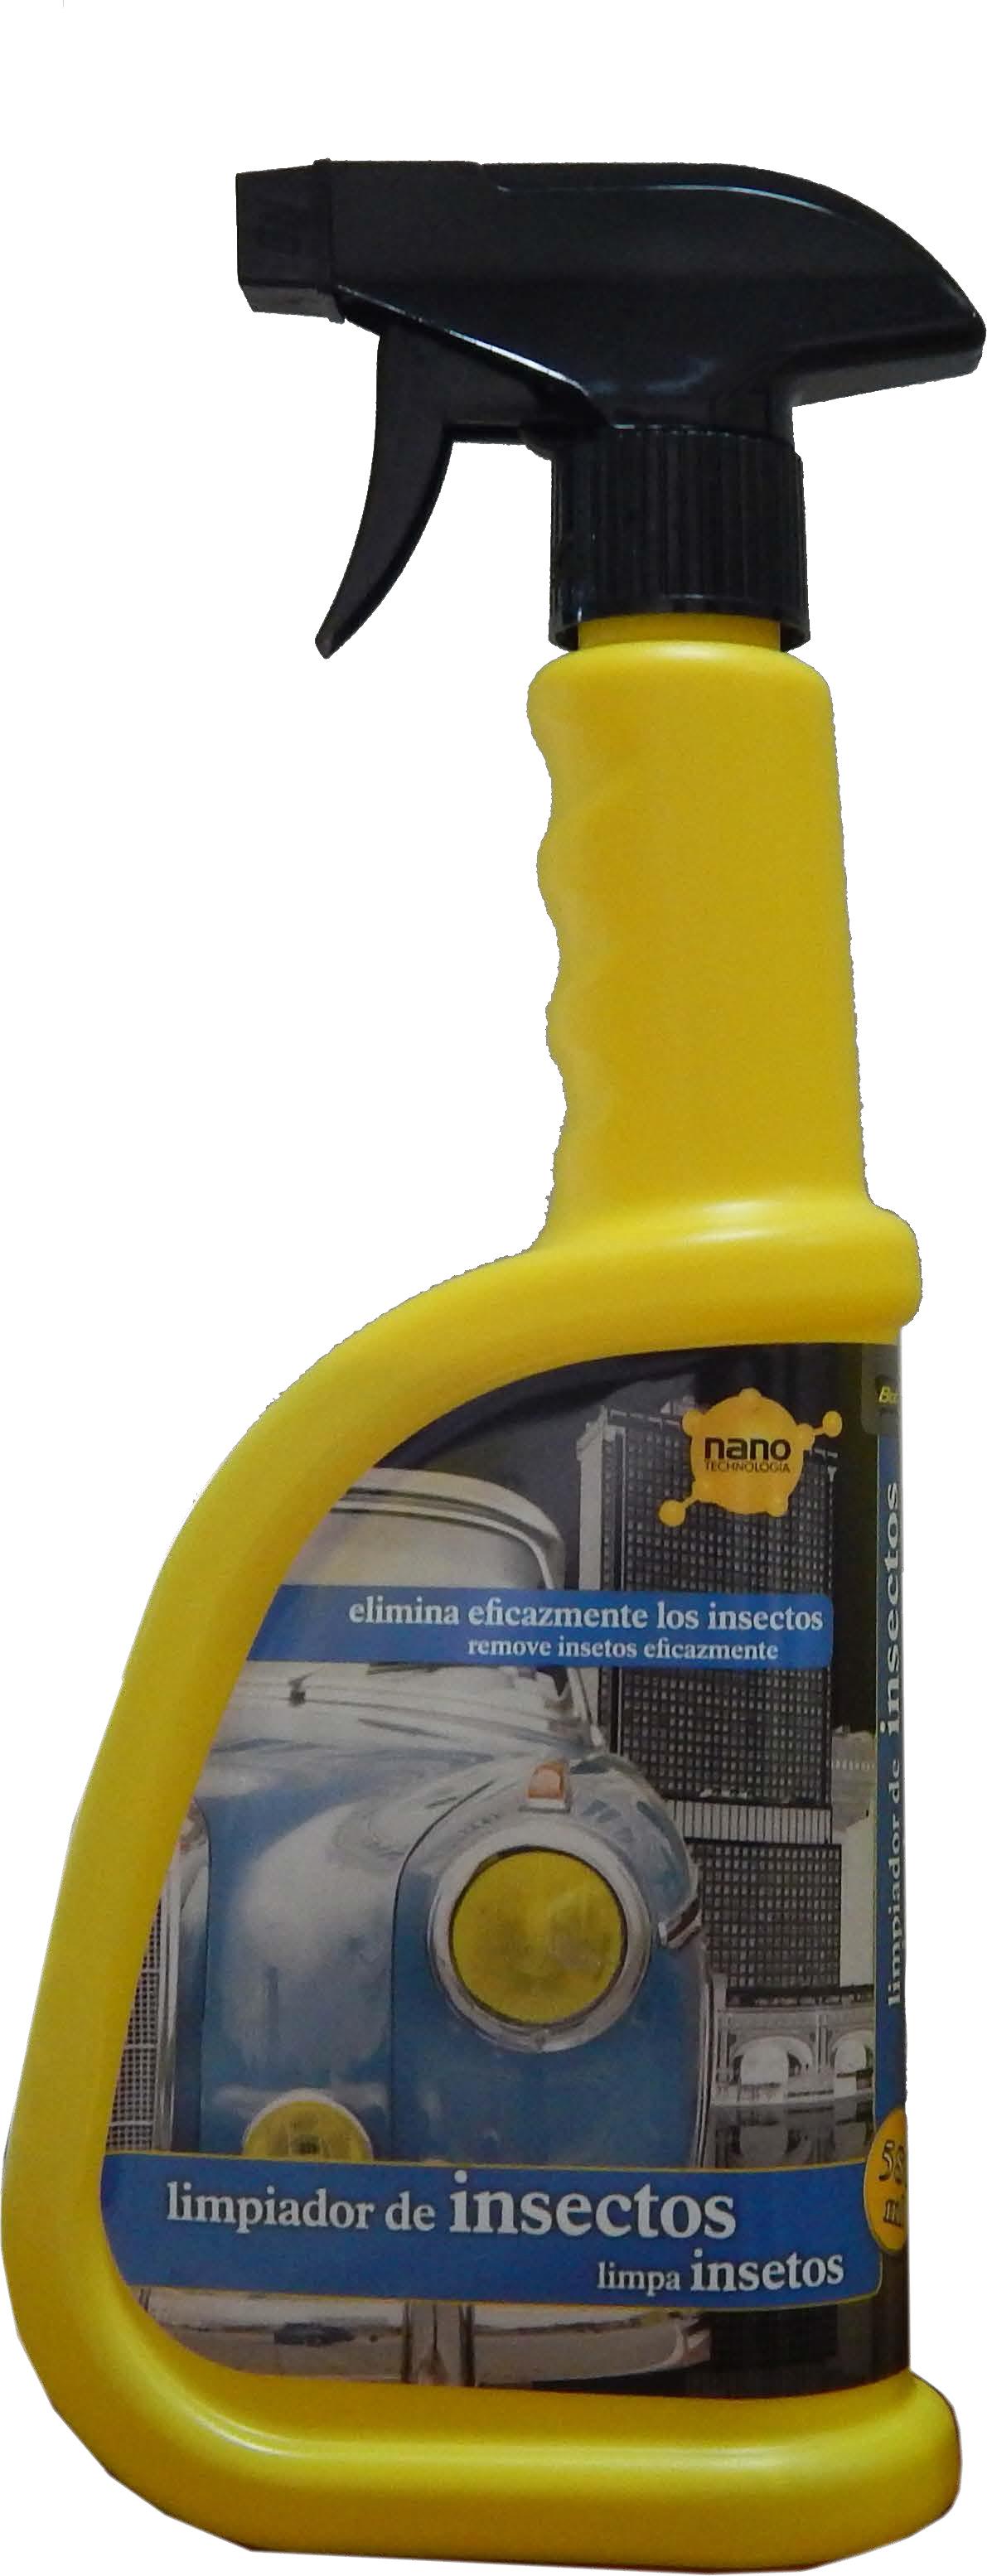 bottari-24503-limpia-insectos-580-ml-spray